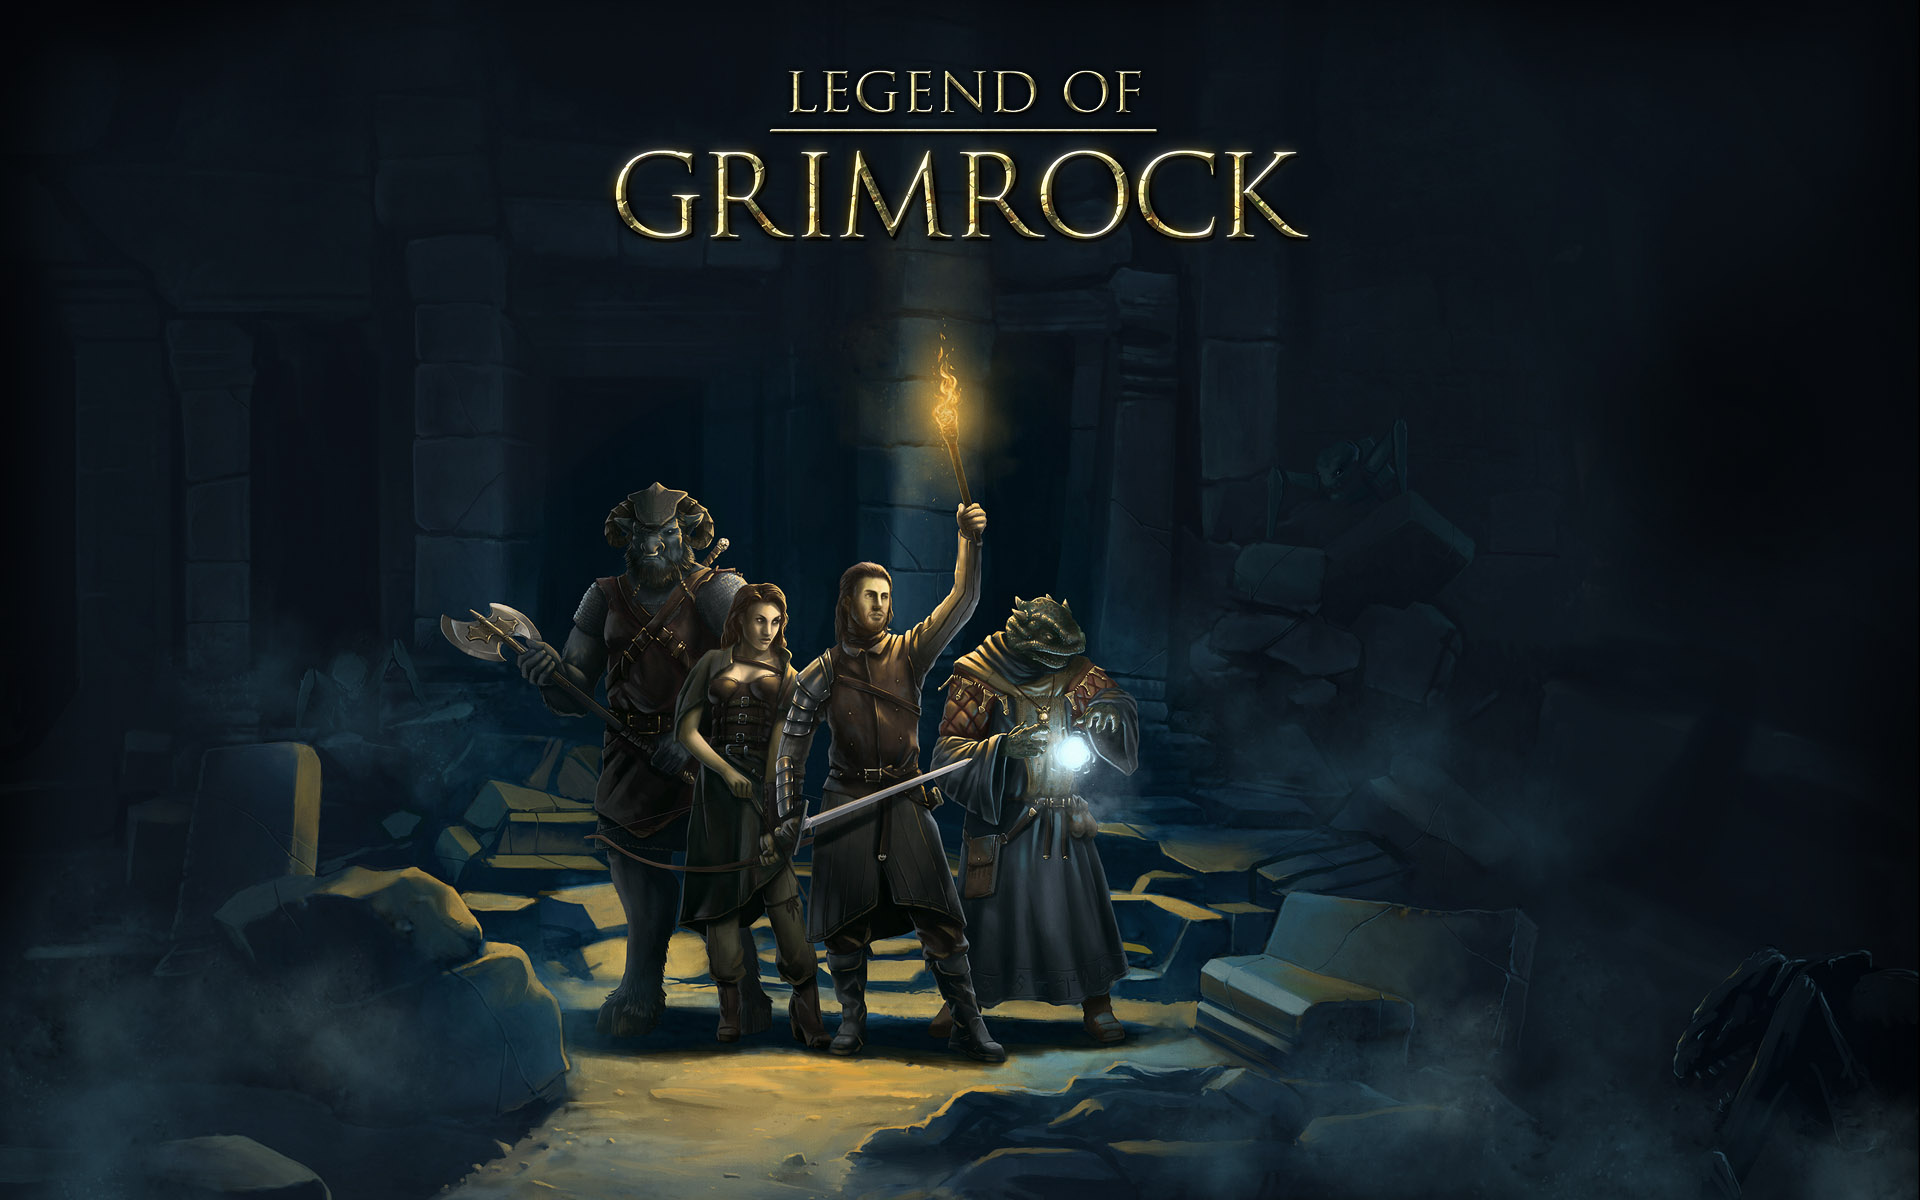 Grimrock 6